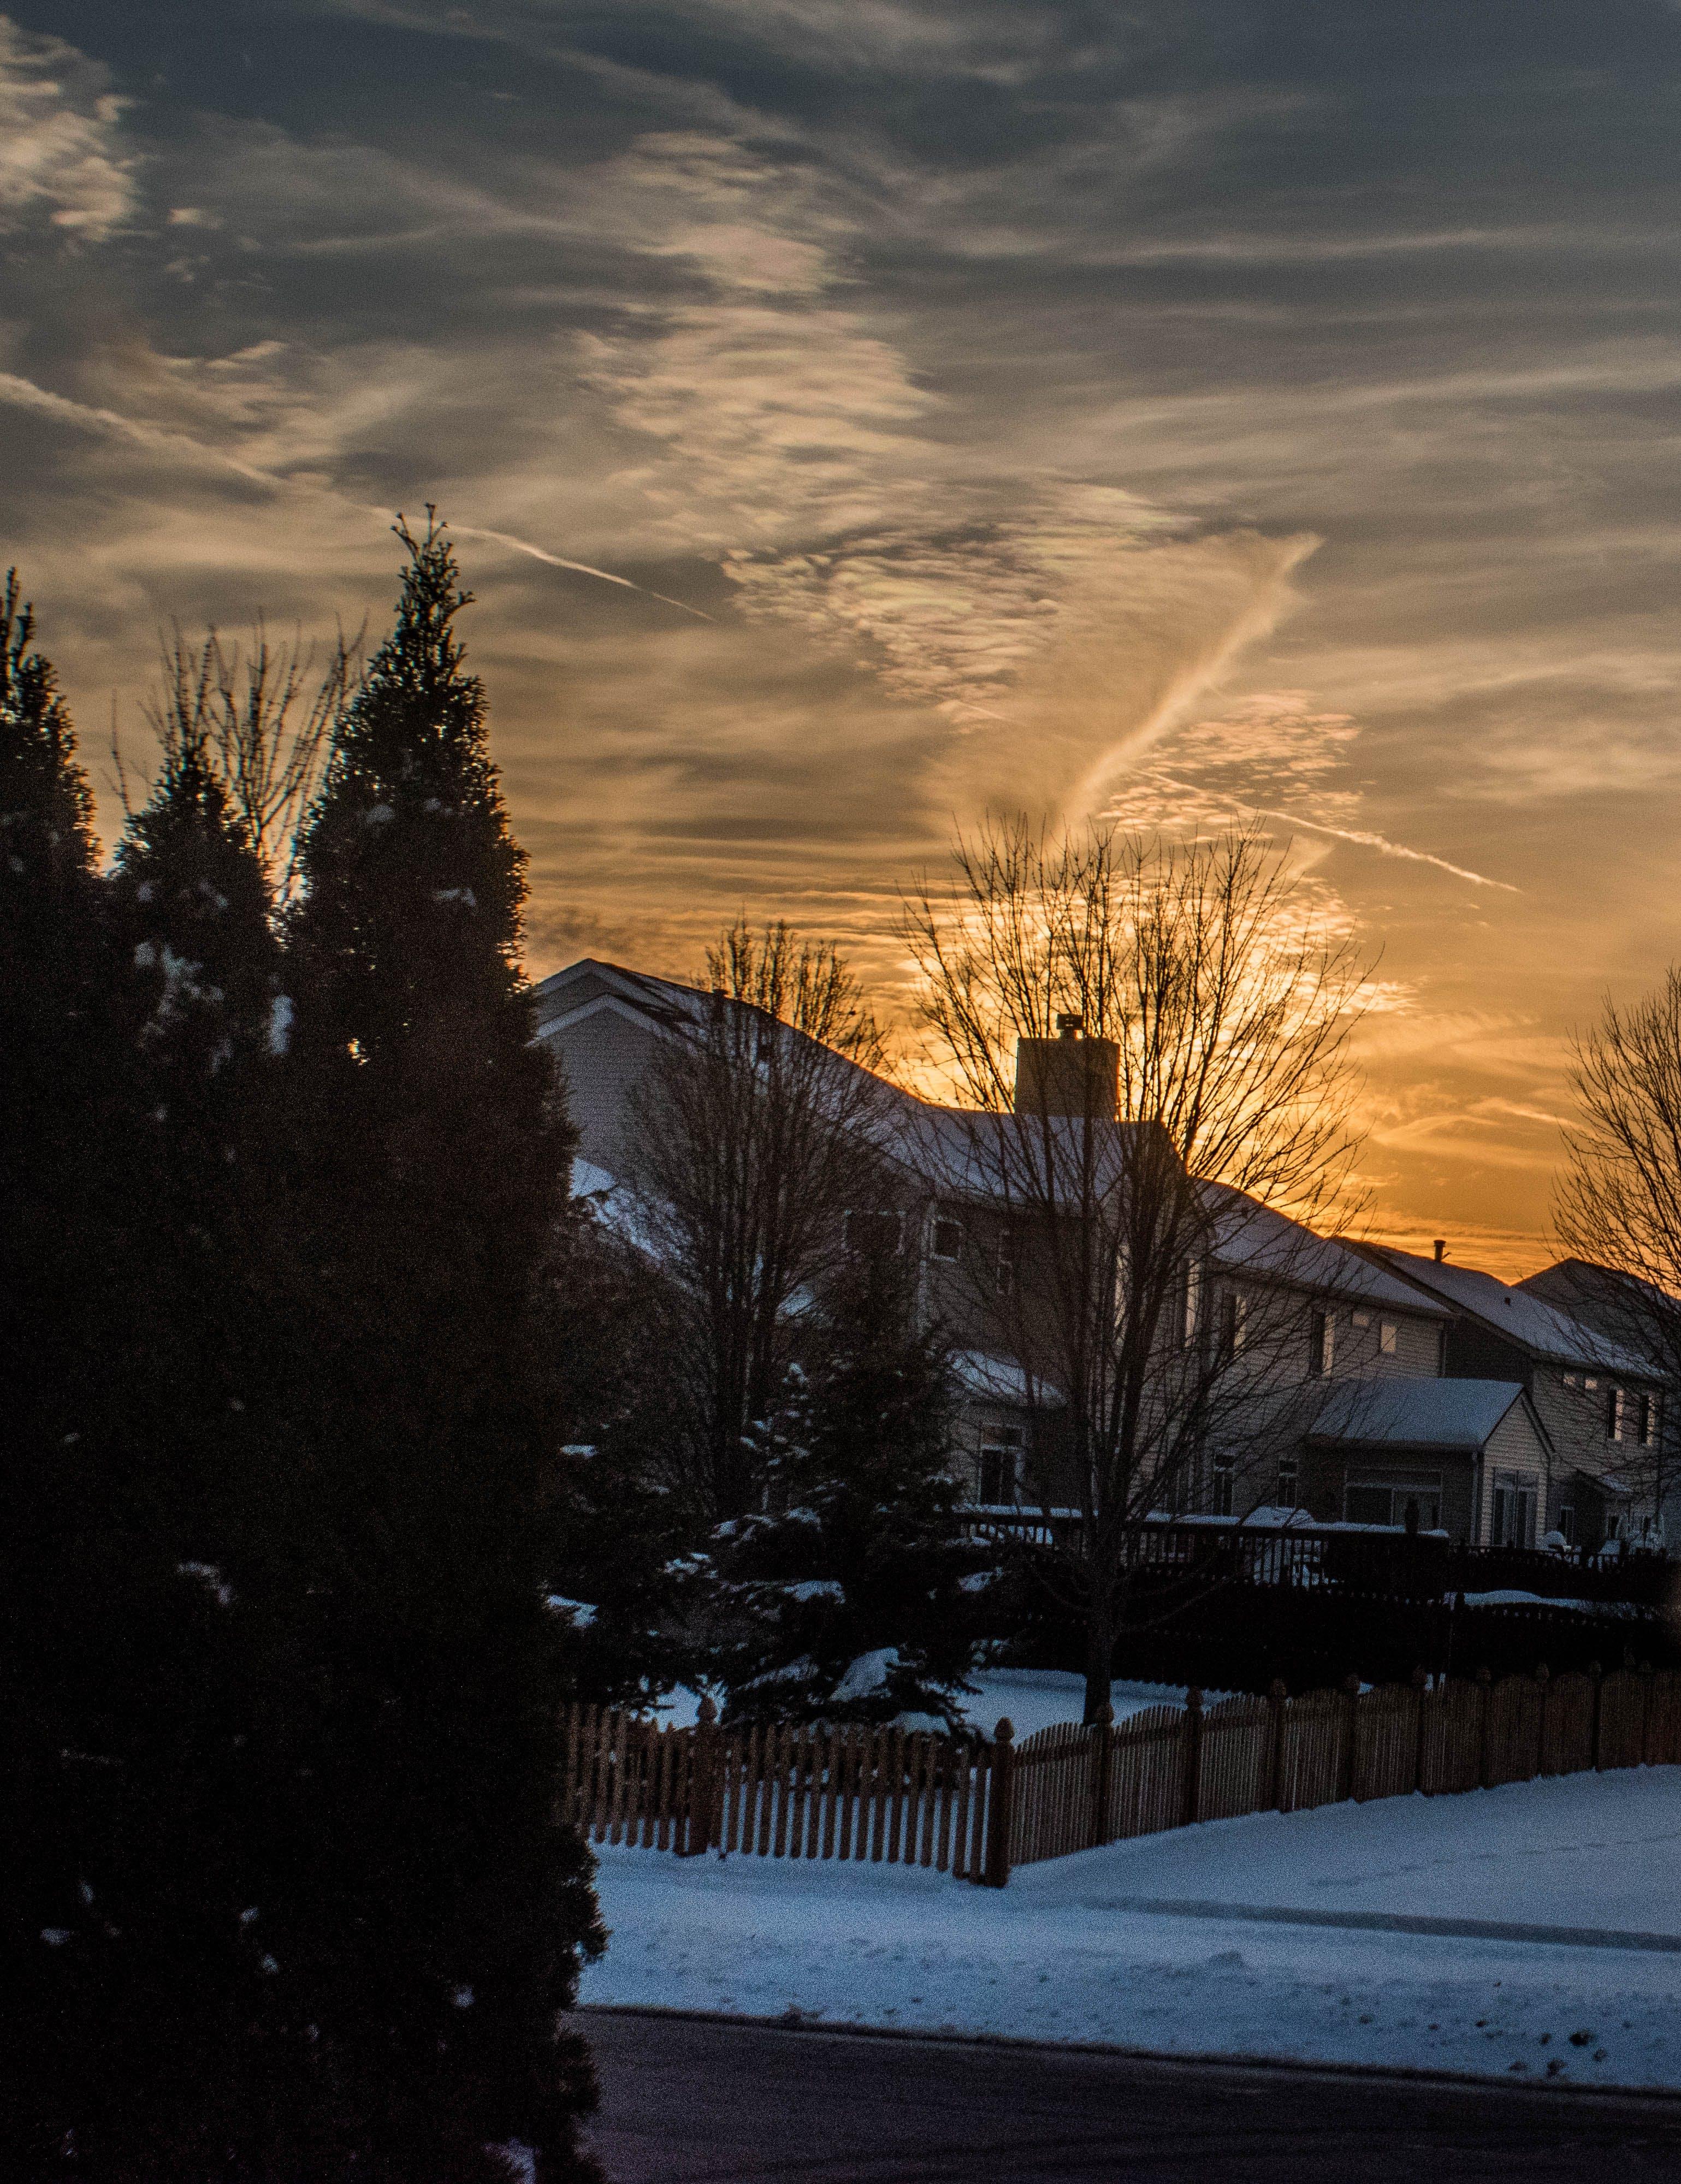 Free stock photo of golden sunset, sunset, winter landscape, winter sunset